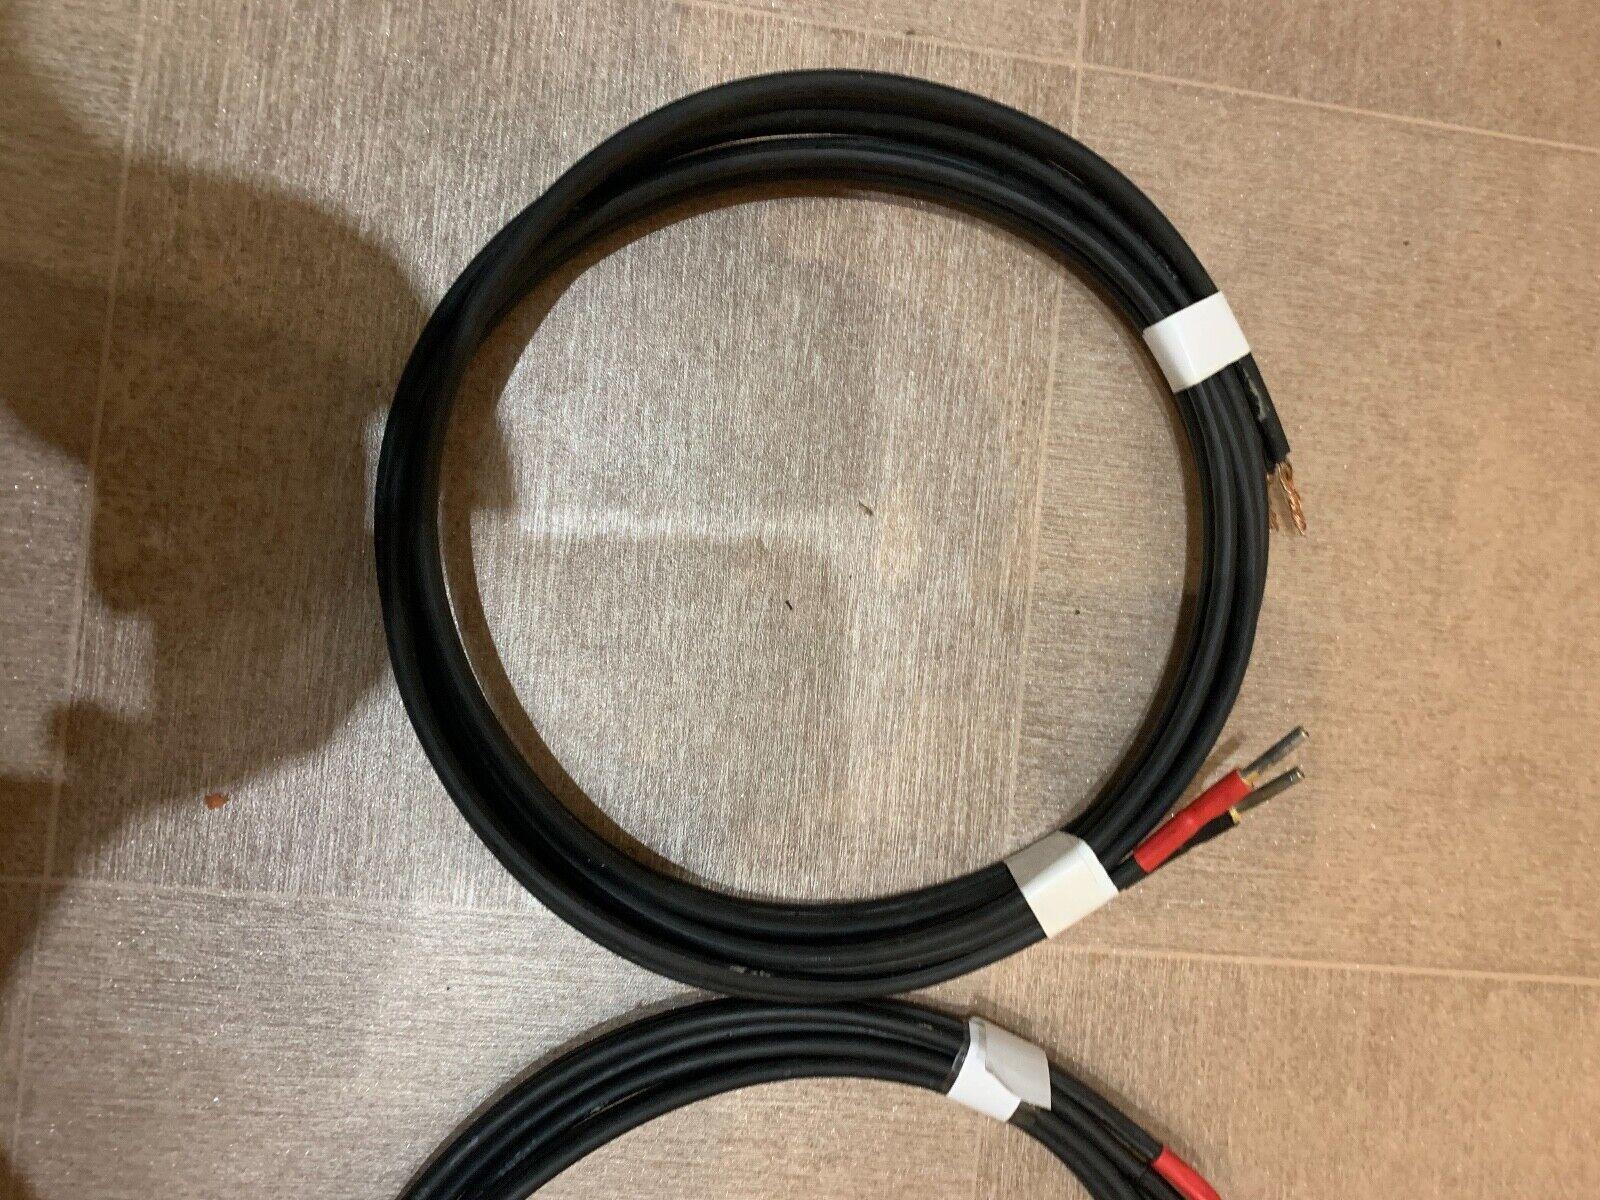 Naim NAC A5 Speaker Cable, 2.75m Pair